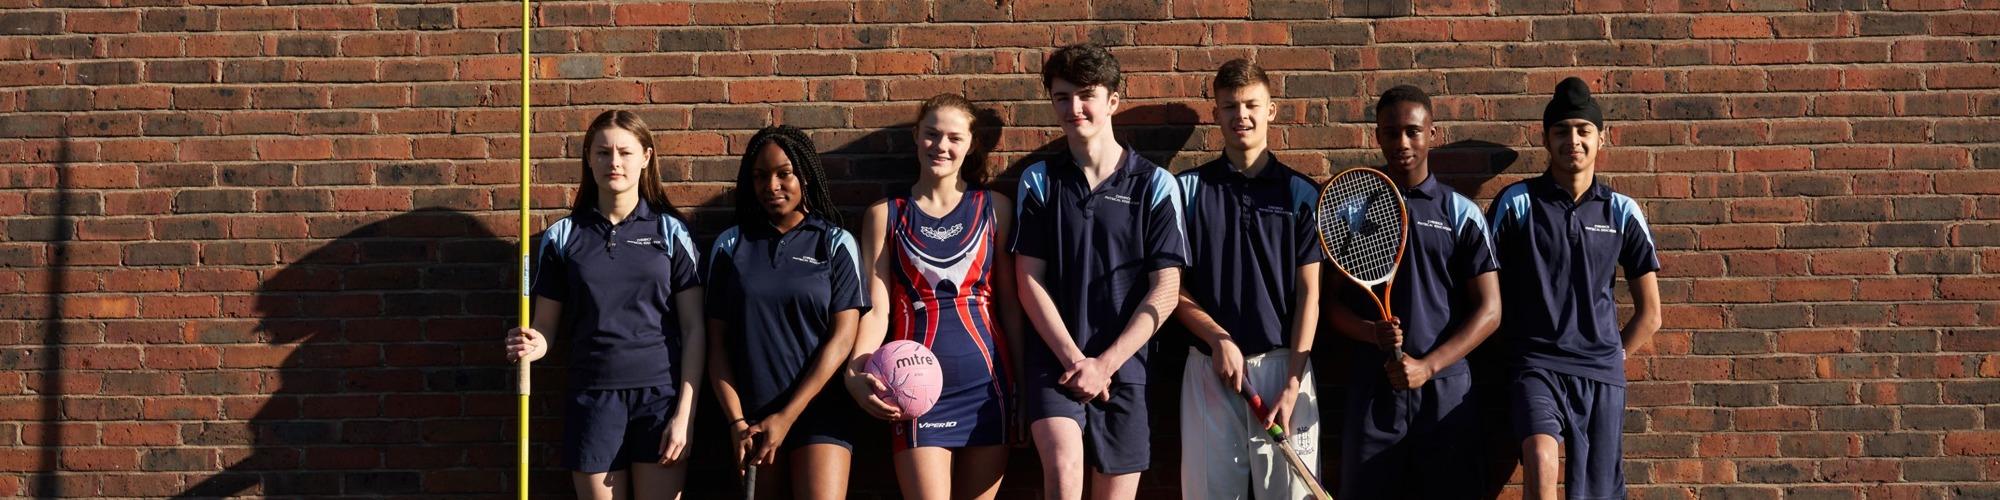 20 02 12.Chiswick School.0874 (web)